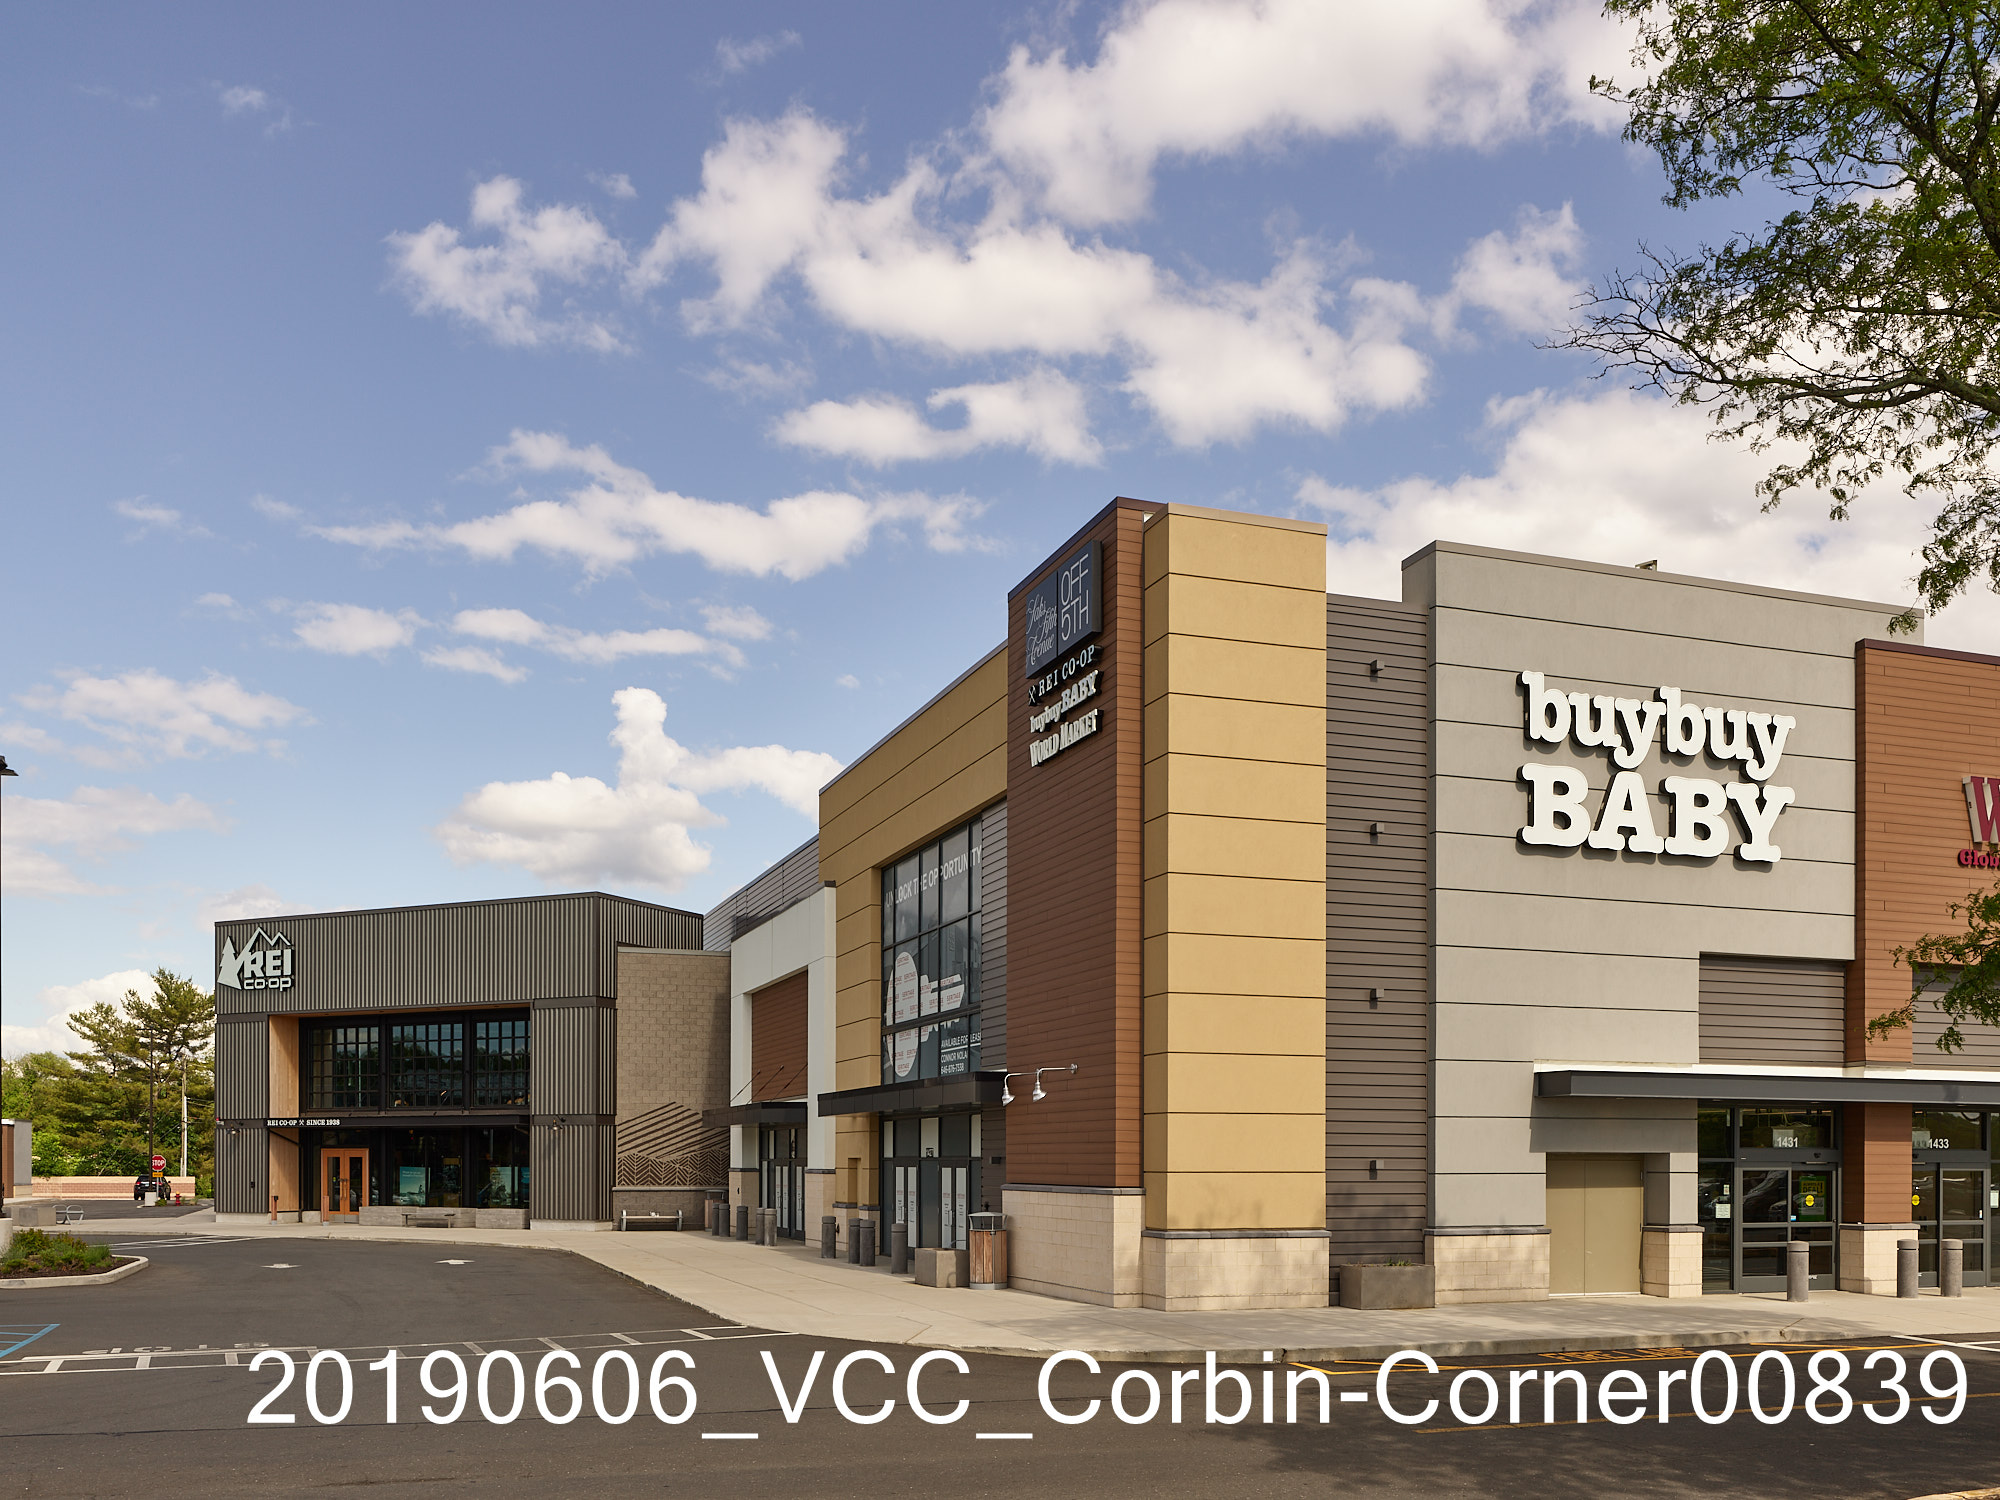 20190606_VCC_Corbin-Corner00839.jpg